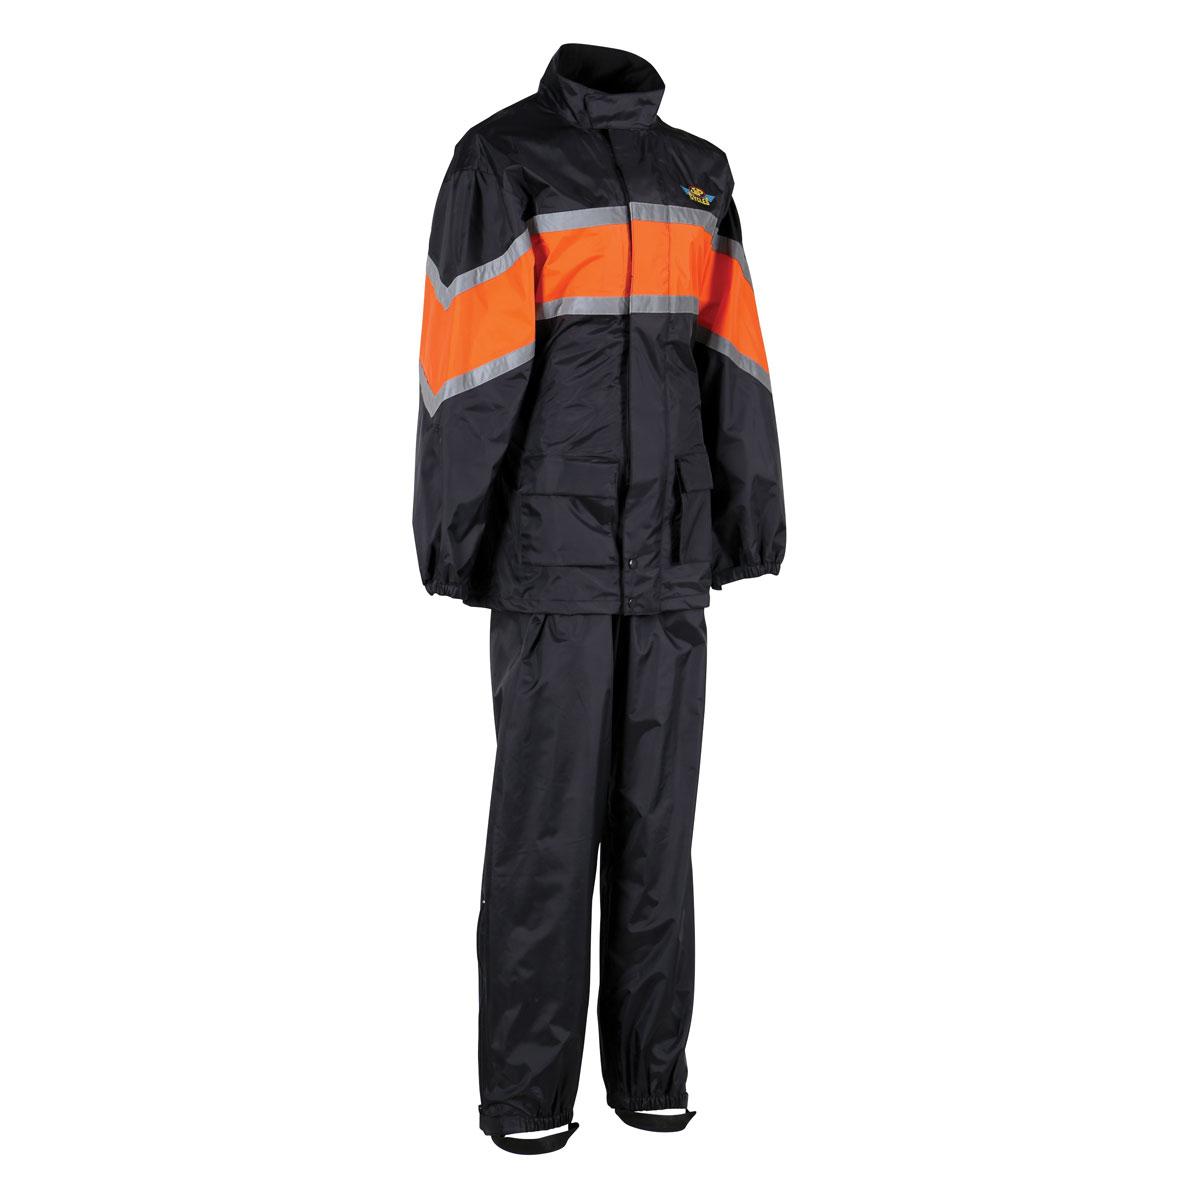 J&P Cycles® Two-Piece Top Quality Rain Suit